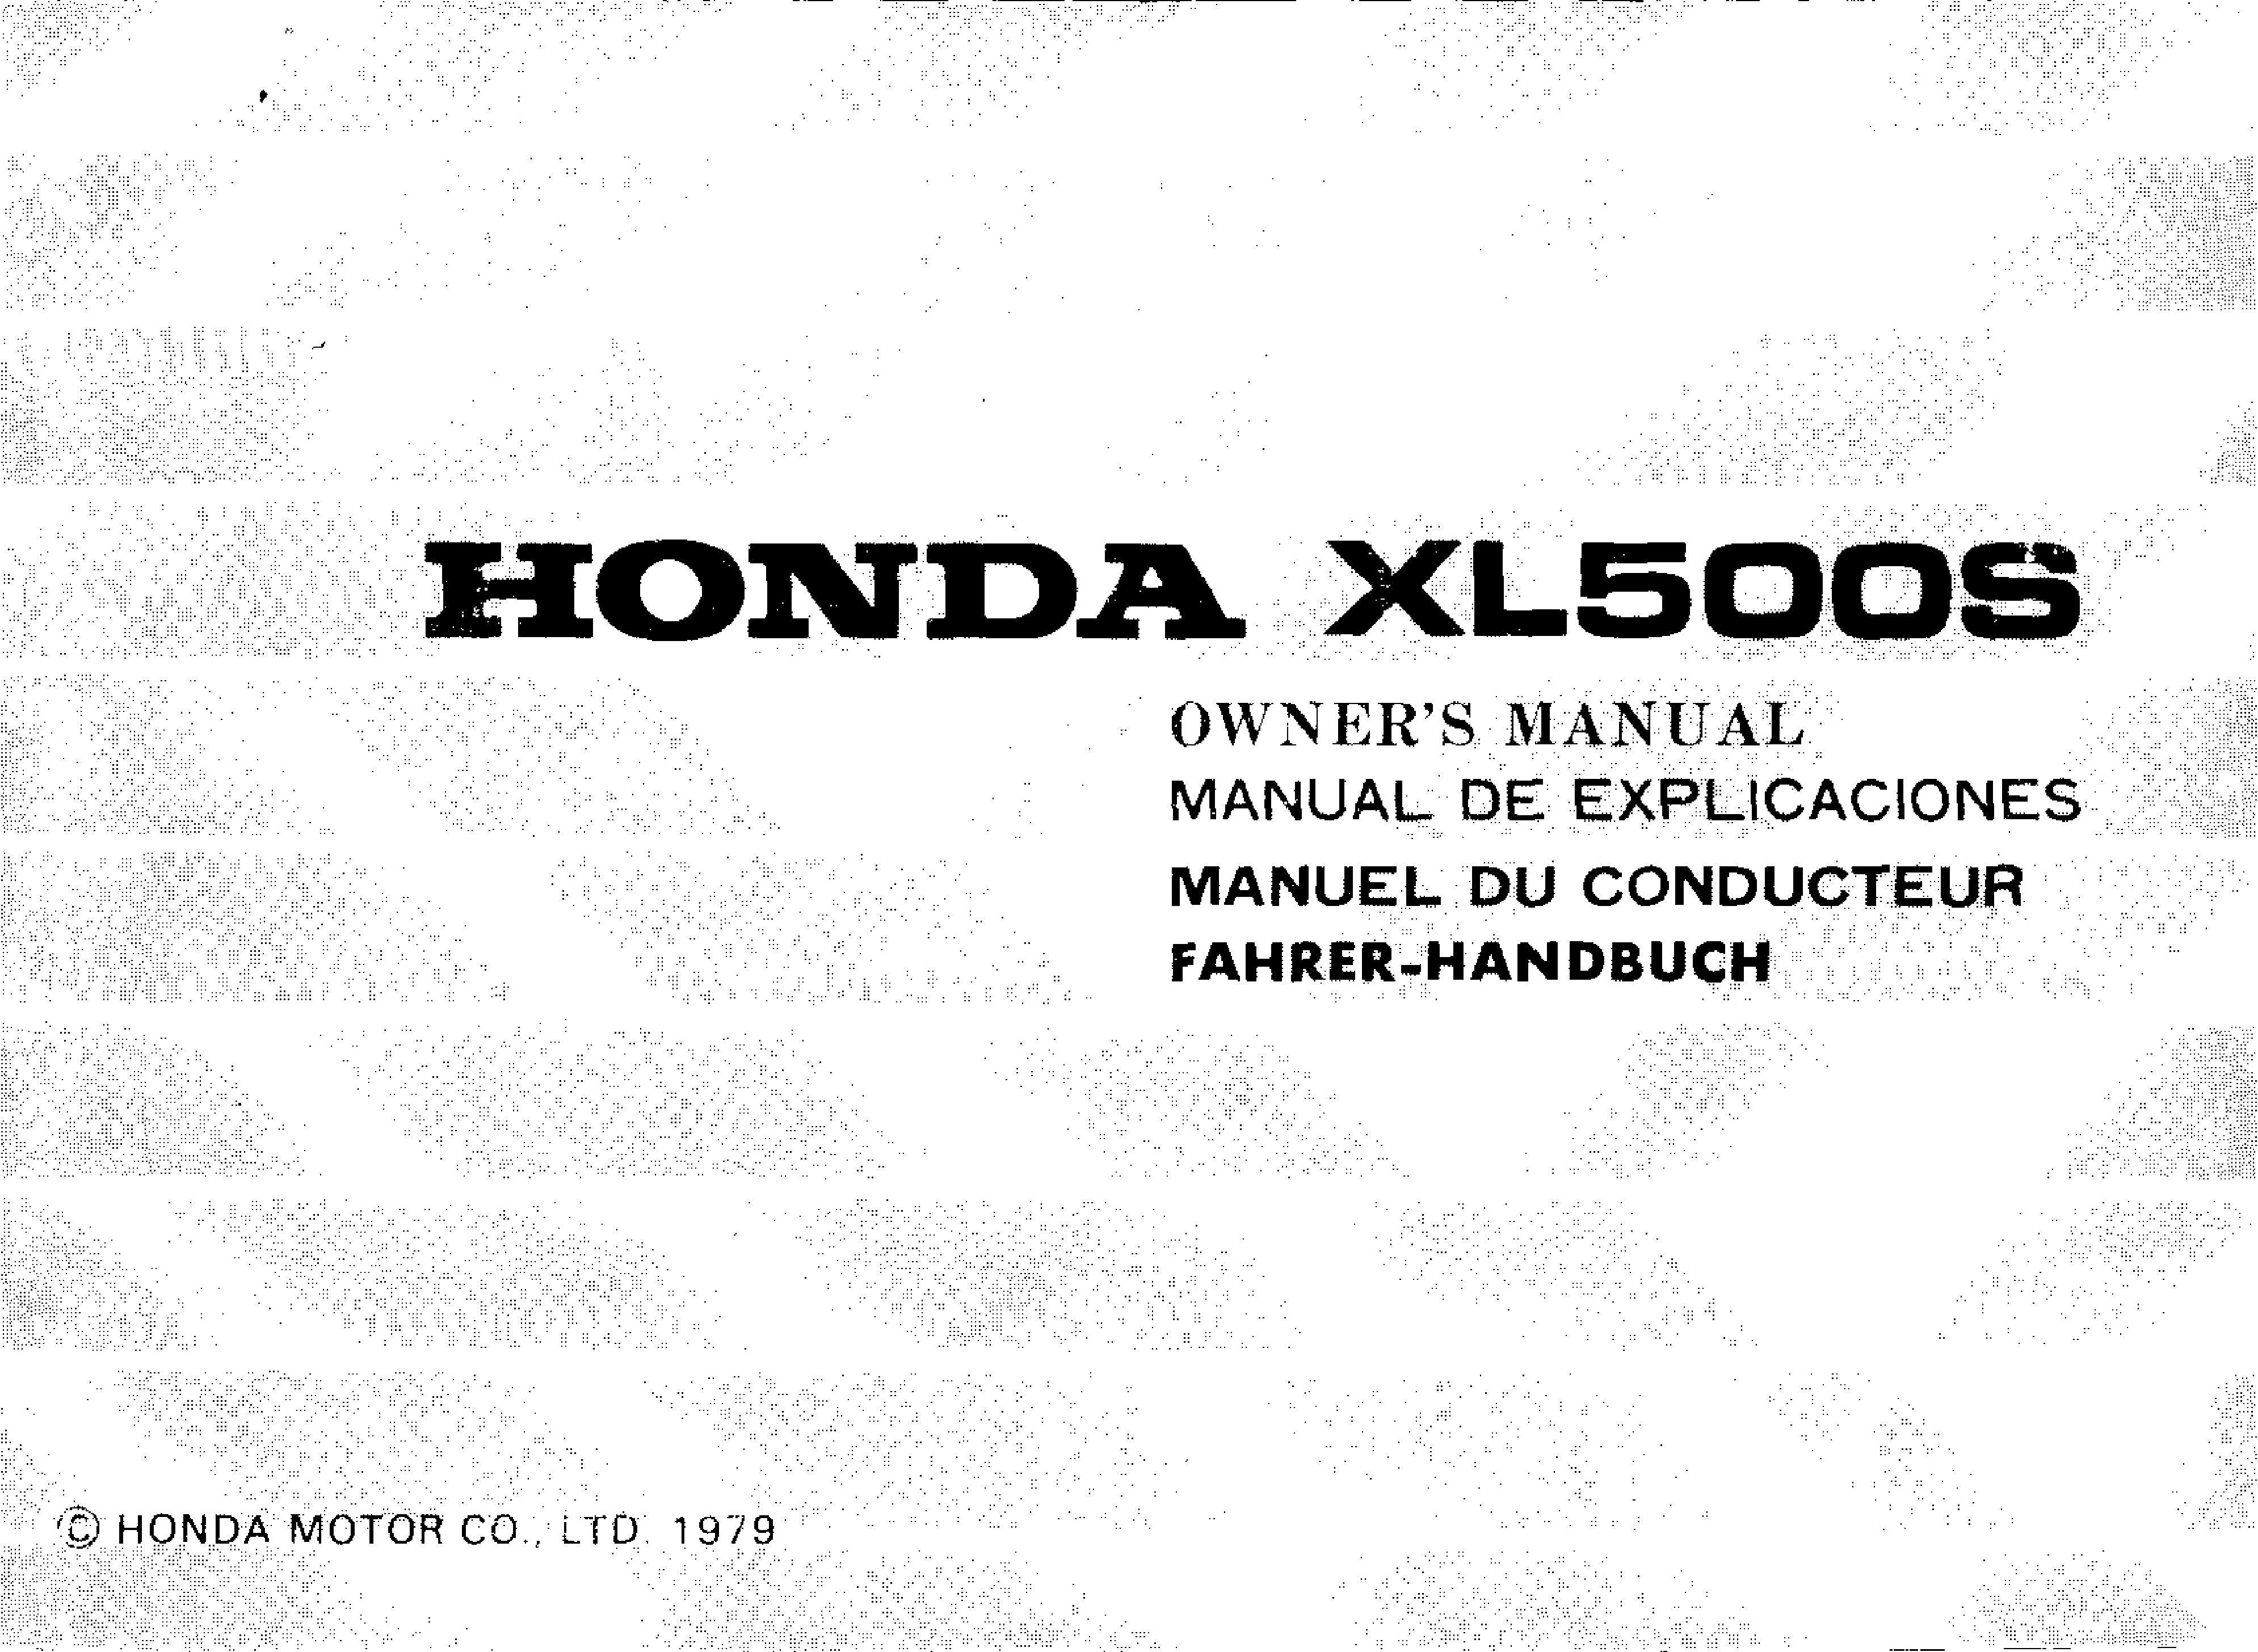 Owner's manual for Honda XL500S (1979)